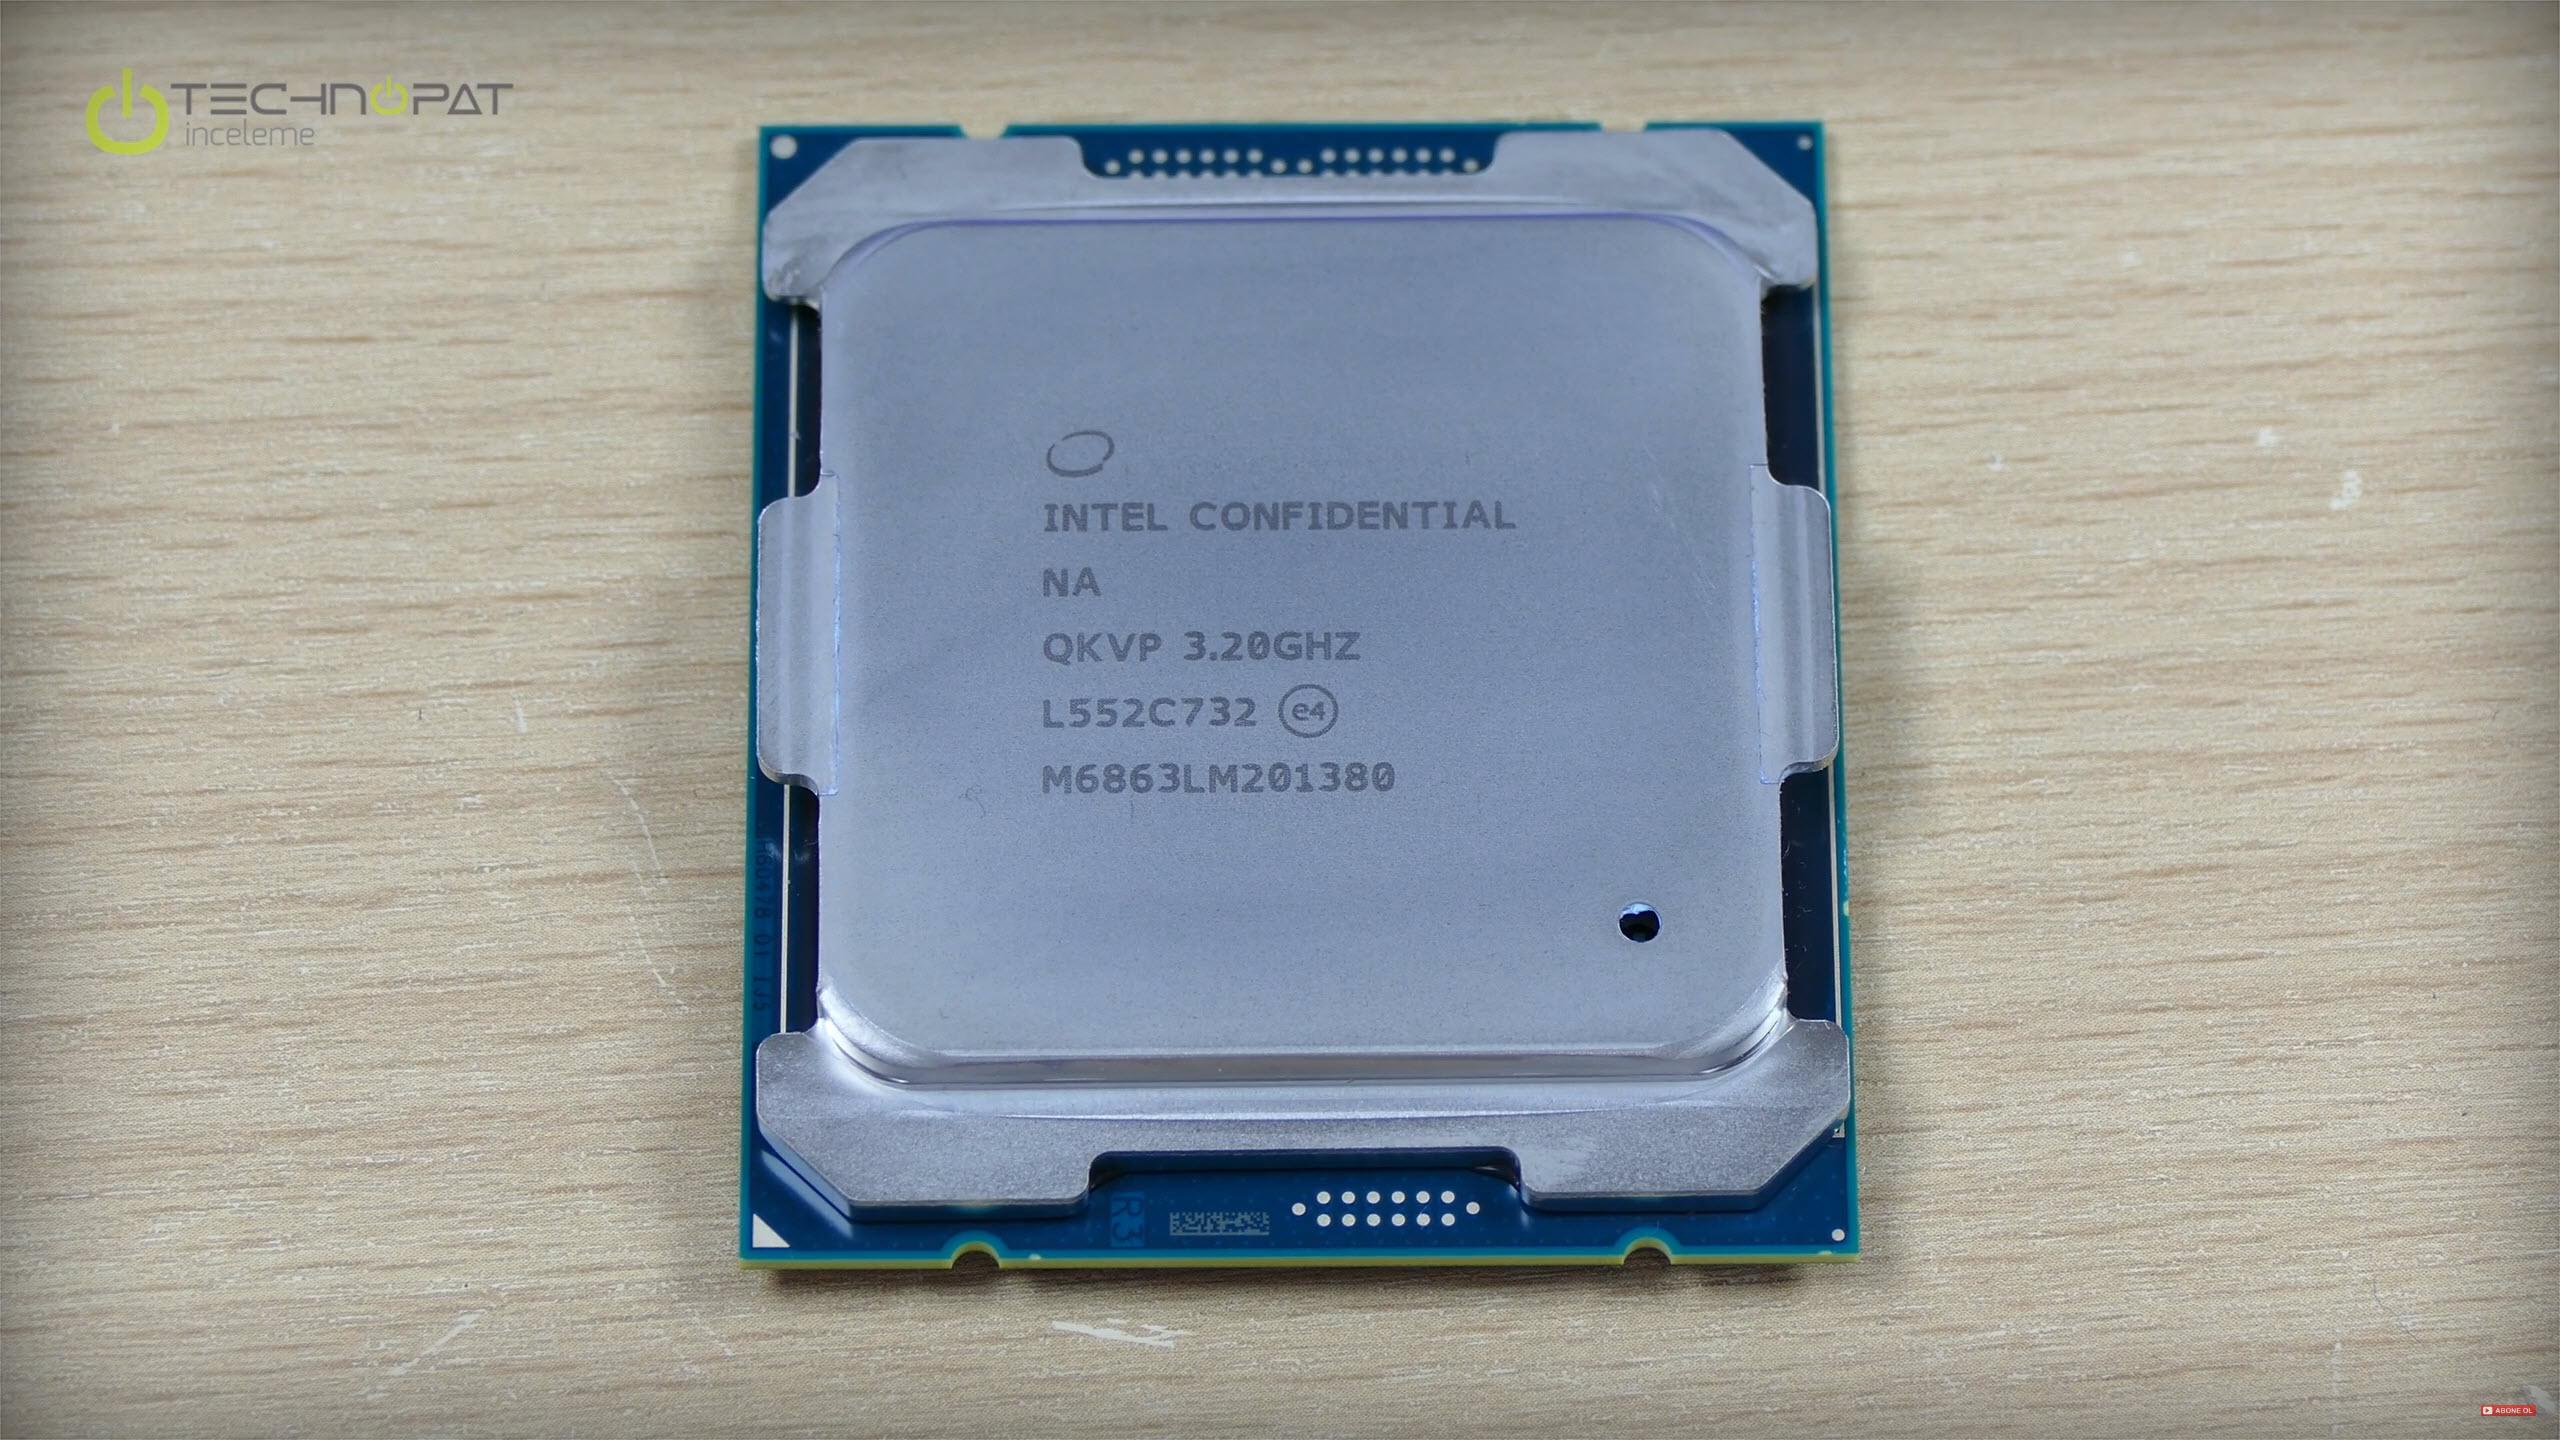 Intel Core i7 6900K İşlemci: 8 Çekirdek